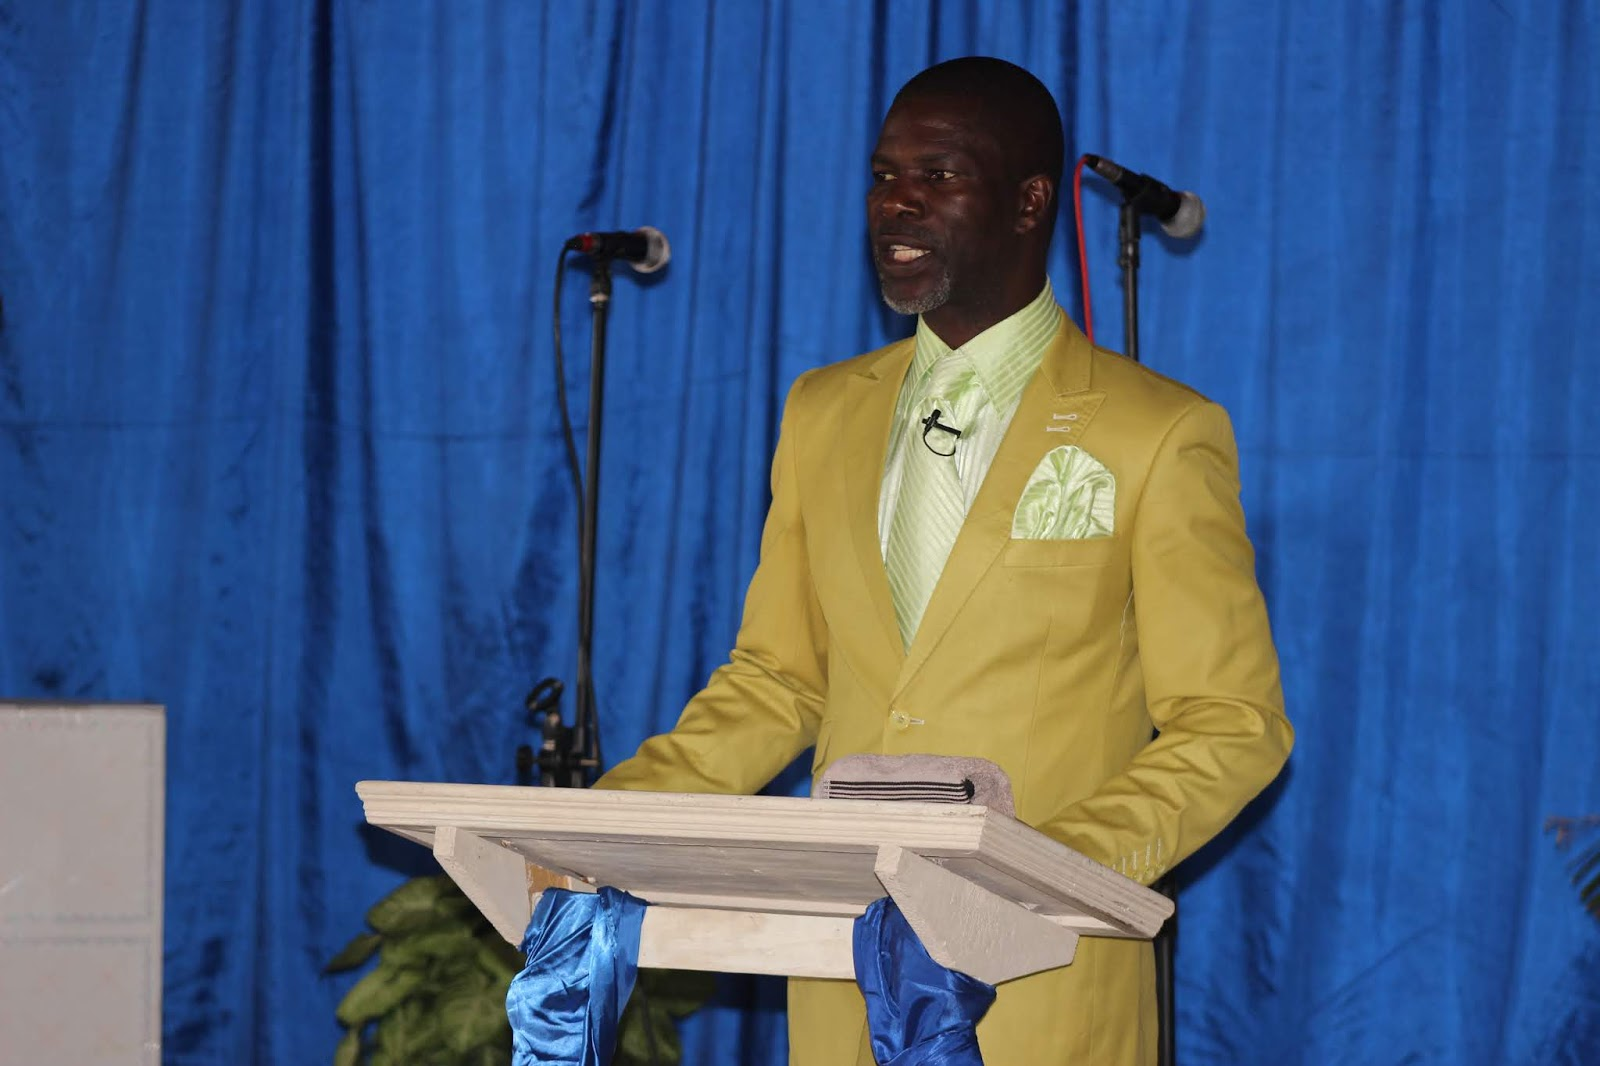 Bishop Nelson Nzvimbo Is The Founder & Bishop Of Ablaze International Ministries, Ablaze Churches international, Holy Ghost School of Ministry - Bishop Nelson Nzvimbo: